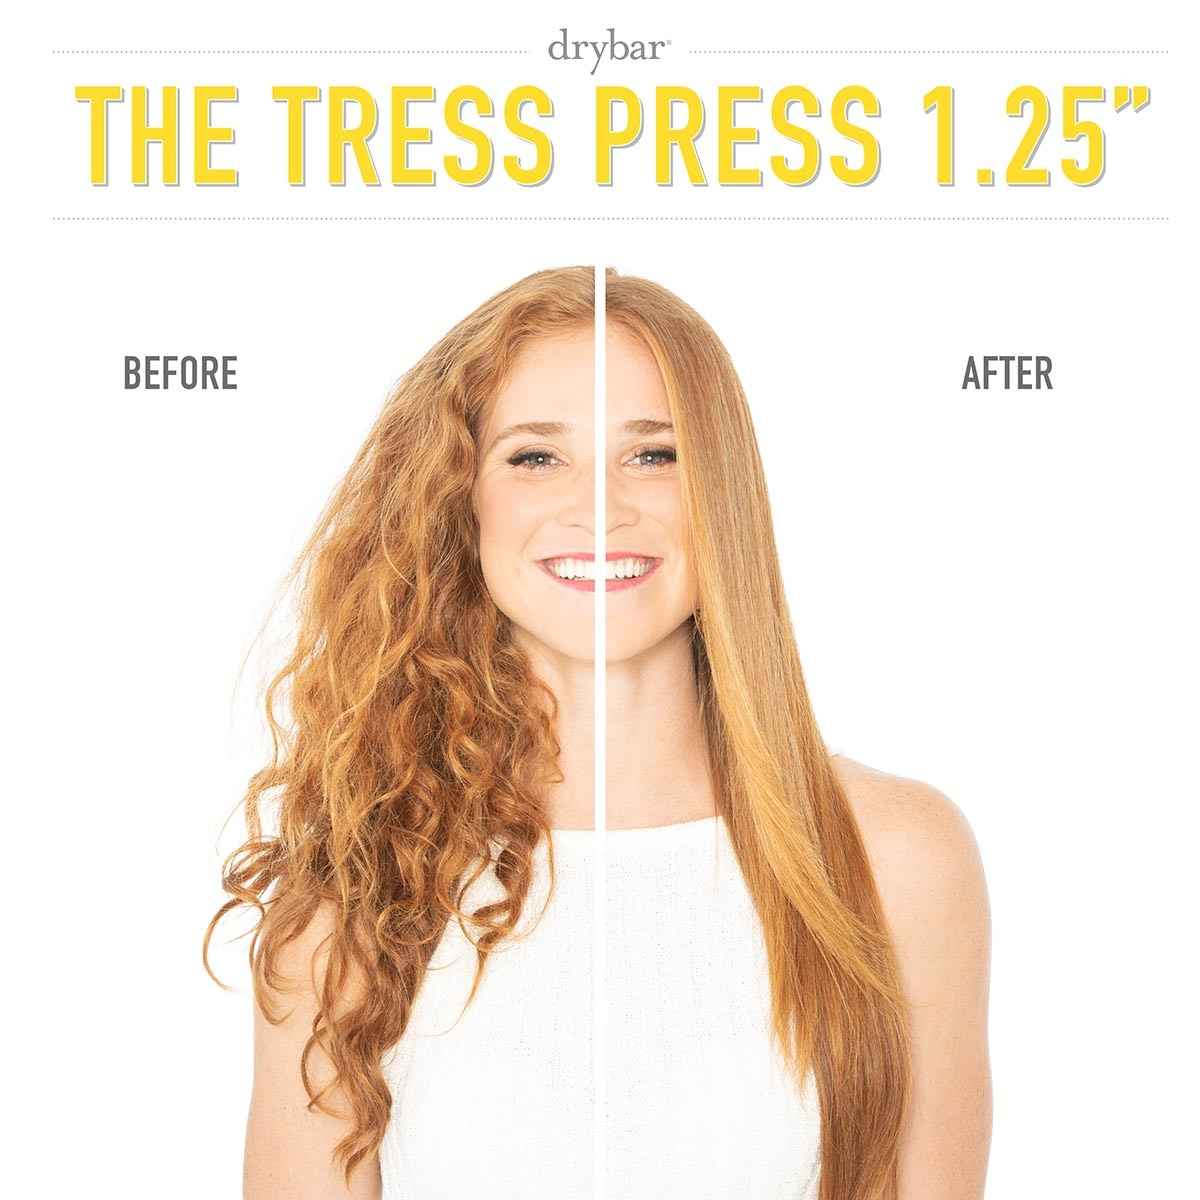 "THE TRESS PRESS STRAIGHTENING IRON 1.25"" (PLANCHA PARA EL CABELLO DE 2.54 CM)"